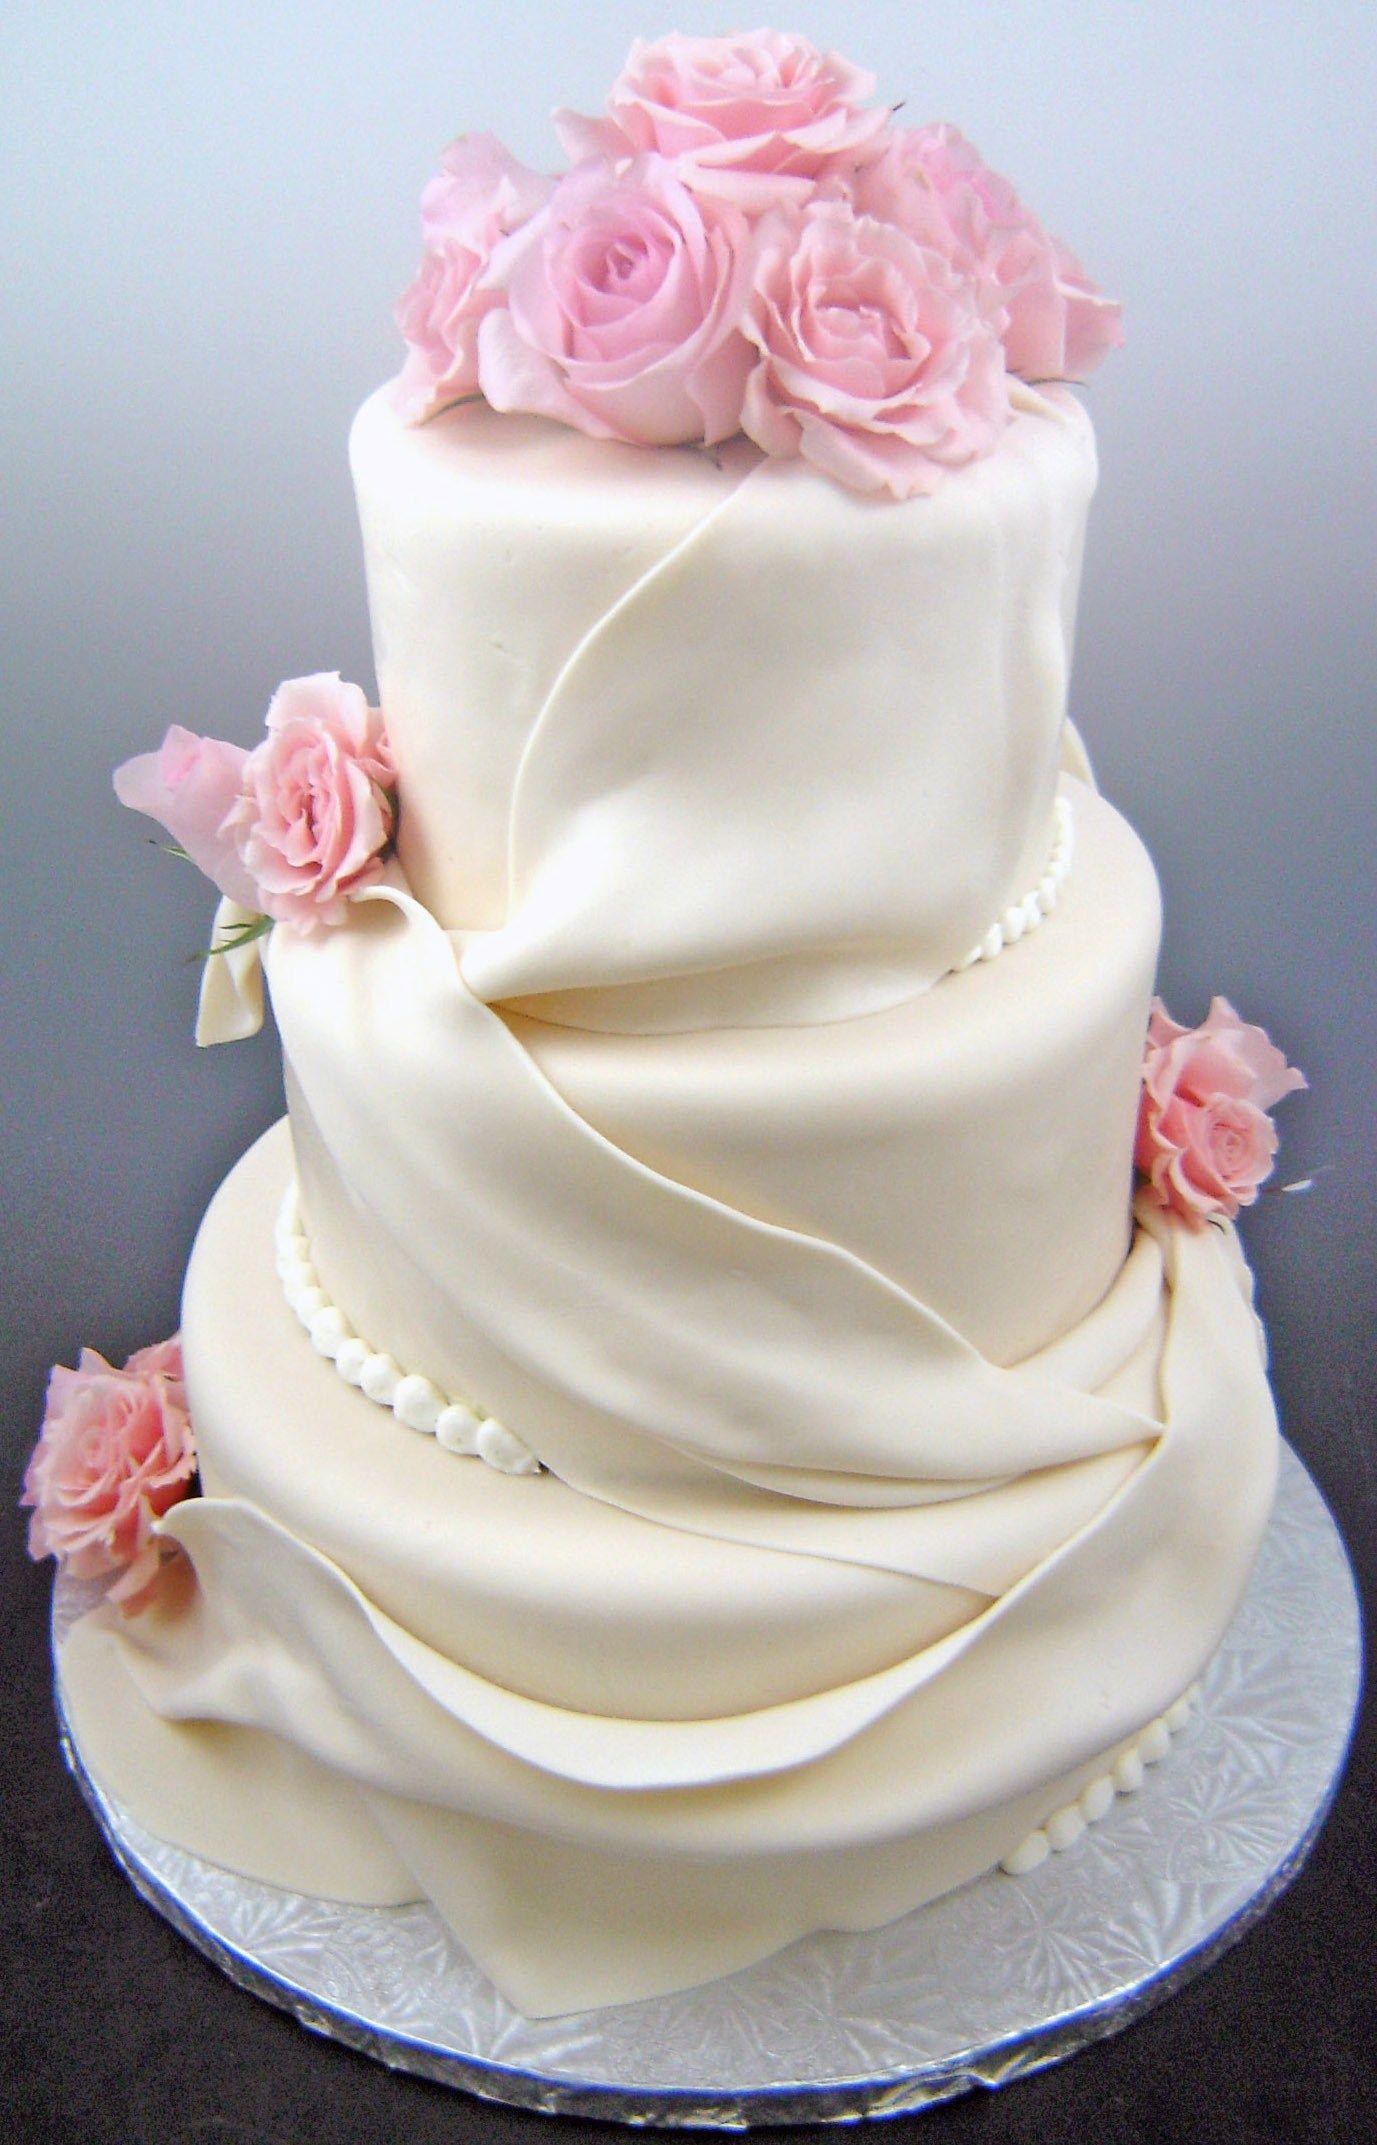 elegant wedding cake | Fondant | Pinterest | Elegant wedding cakes ...